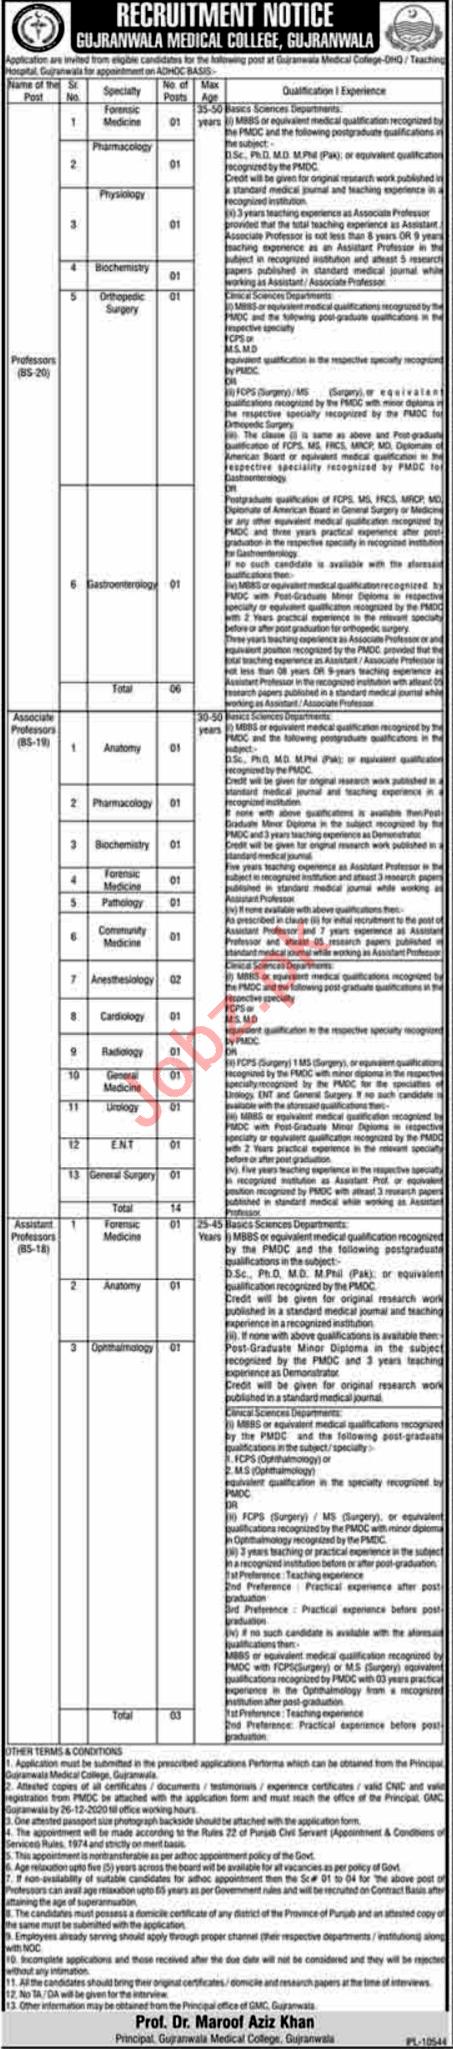 Gujranwala Medical College GMC Gujranwala Jobs 2020